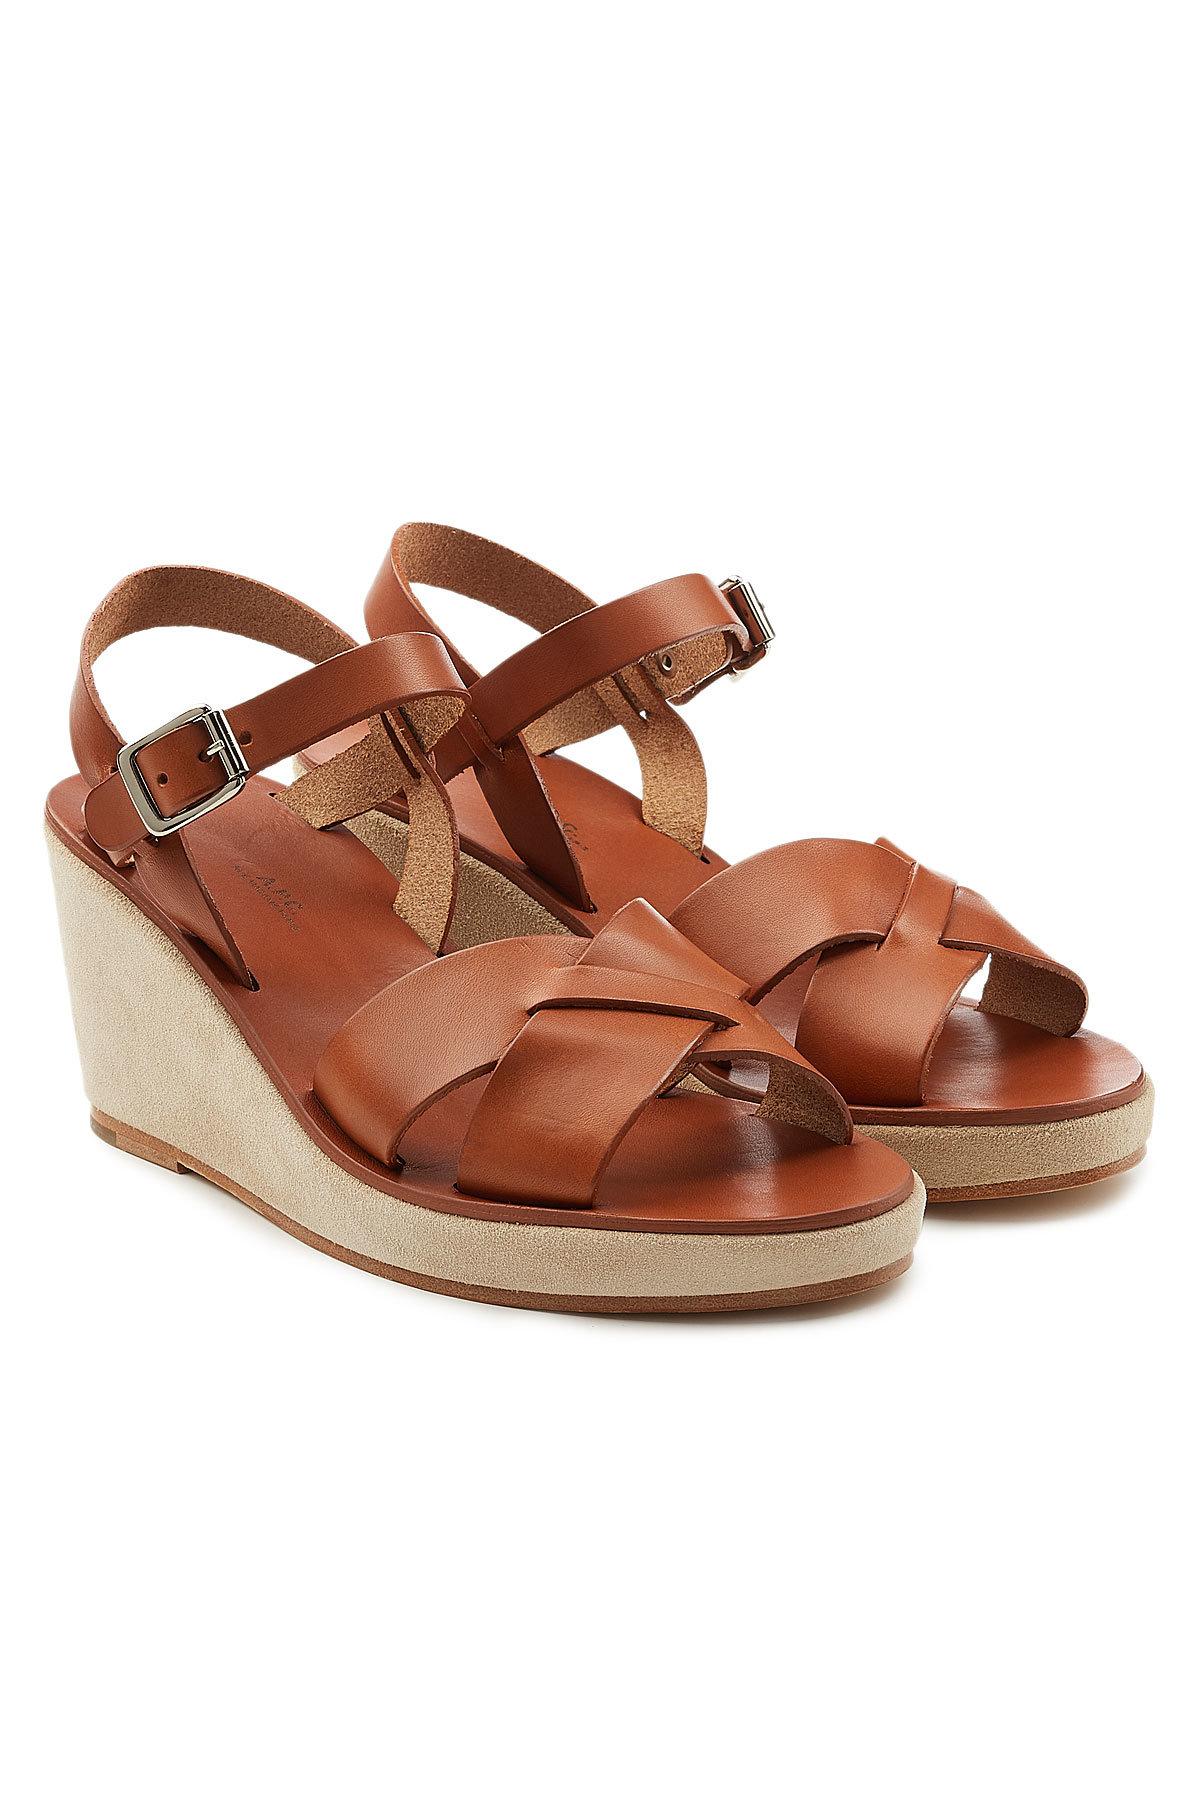 Marni Leather Sandals Gr. EU 39